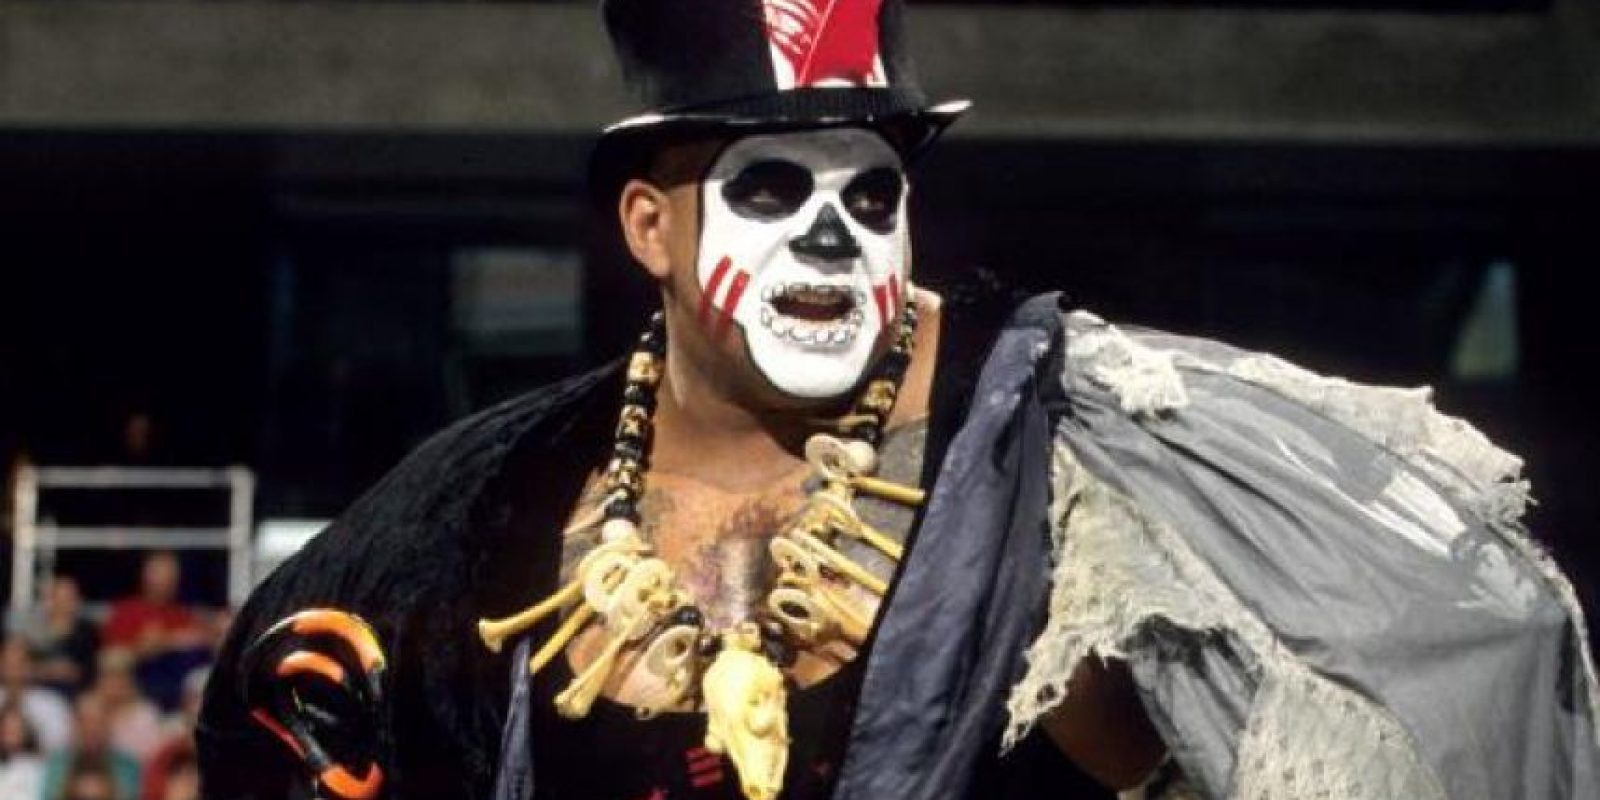 Lucía como un brujo vudú Foto:WWE